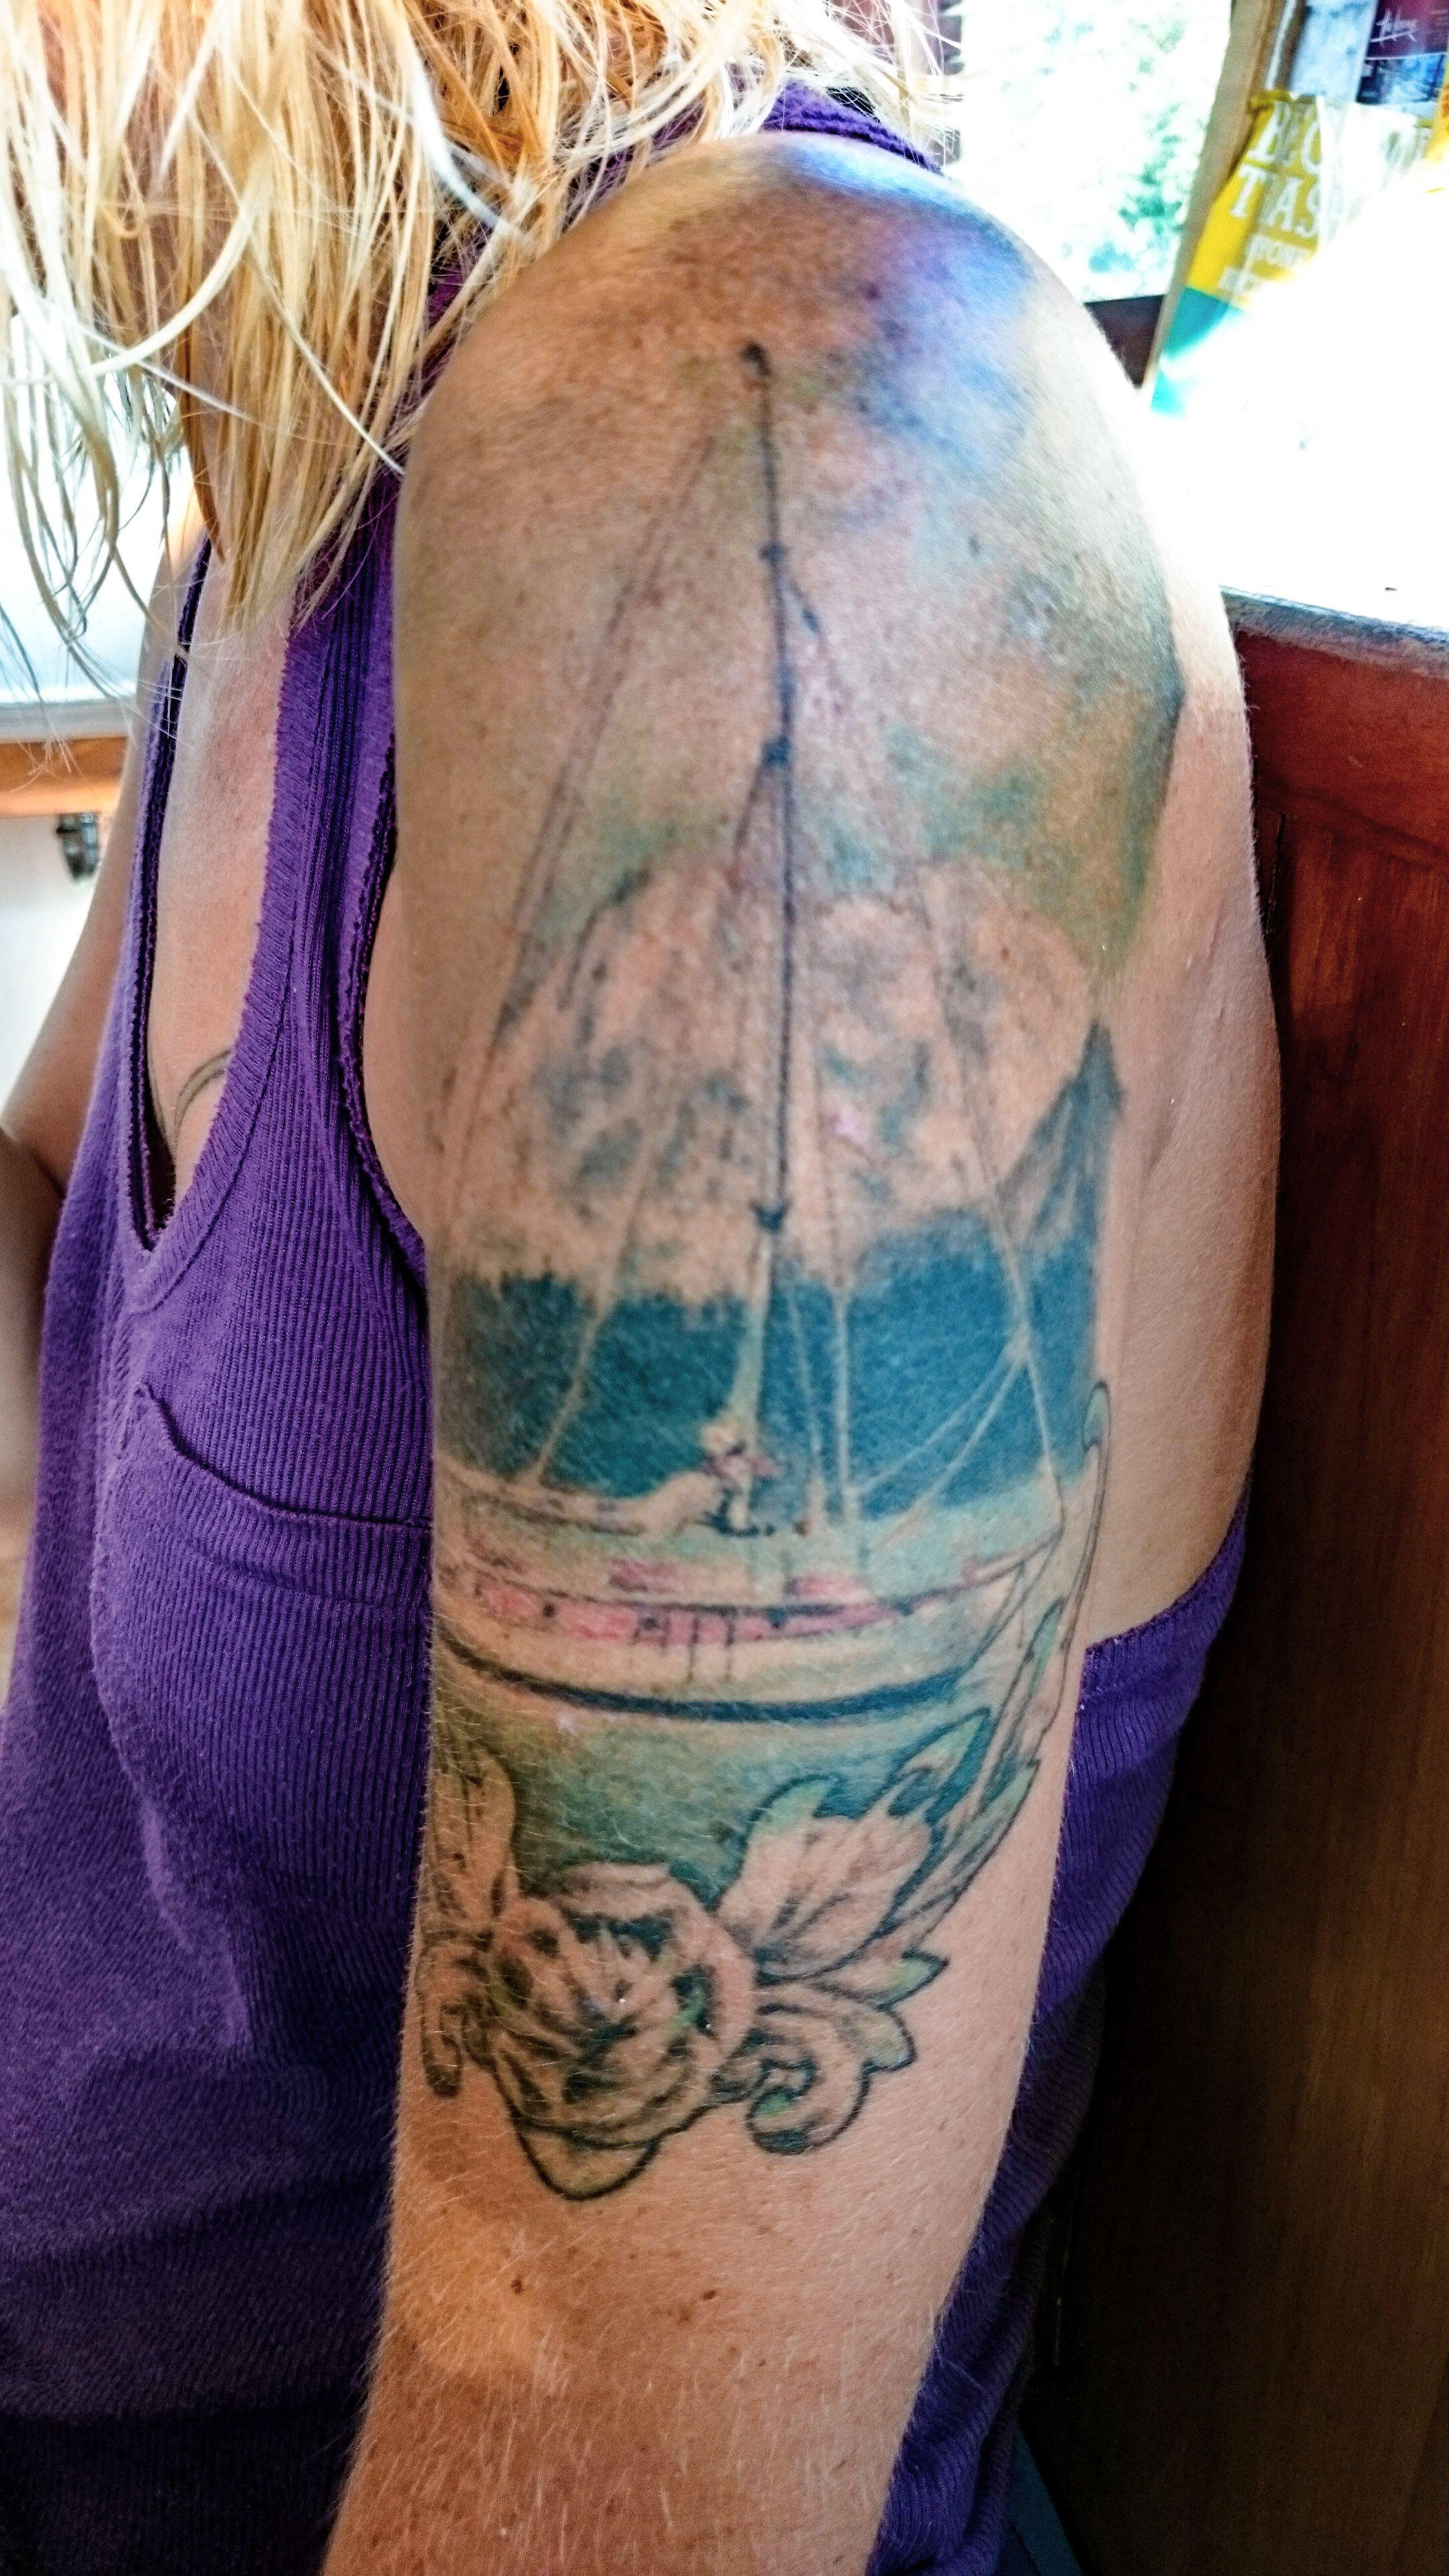 megan tattoo in blue marlin komodo restaurant sailing boat best rh pinterest co uk White Marlin Tattoo On Arm Florida Marlins Tattoo Designs